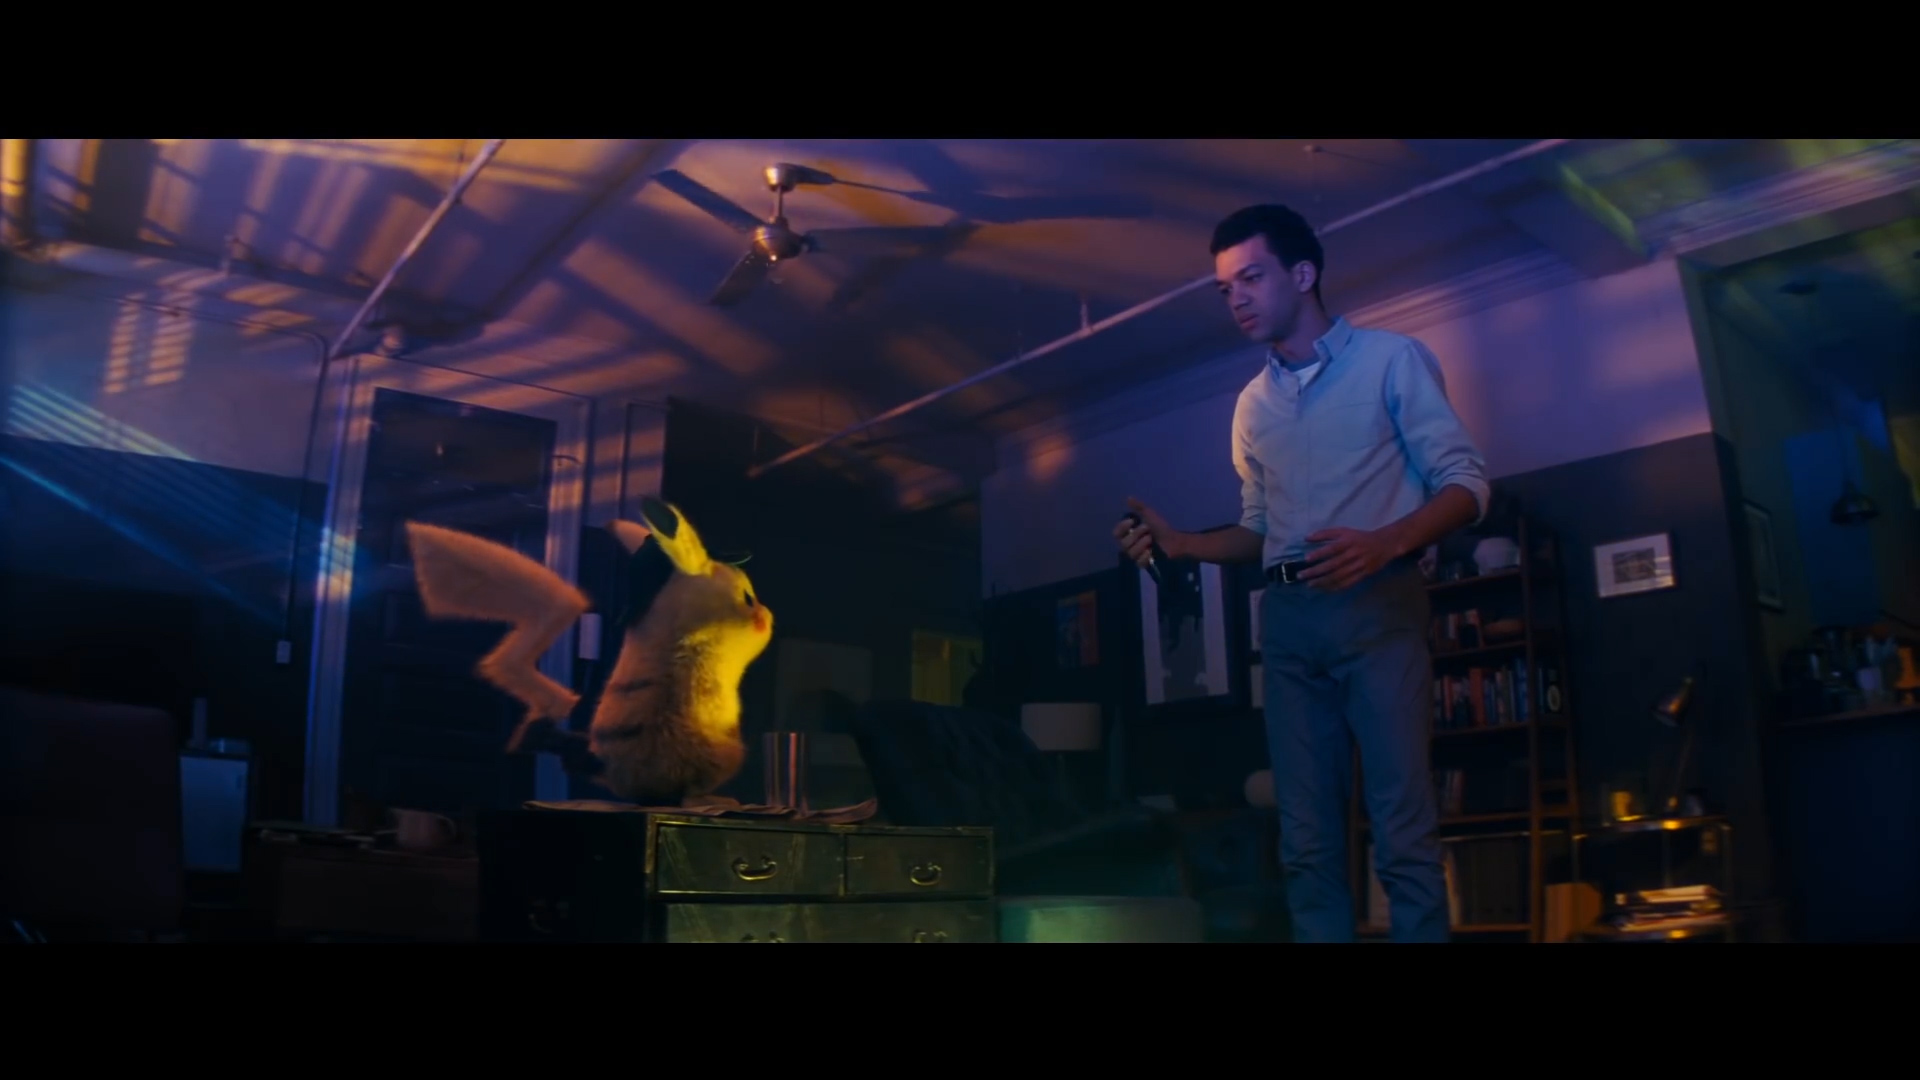 [1] Detective Pikachu - Official Trailer 2